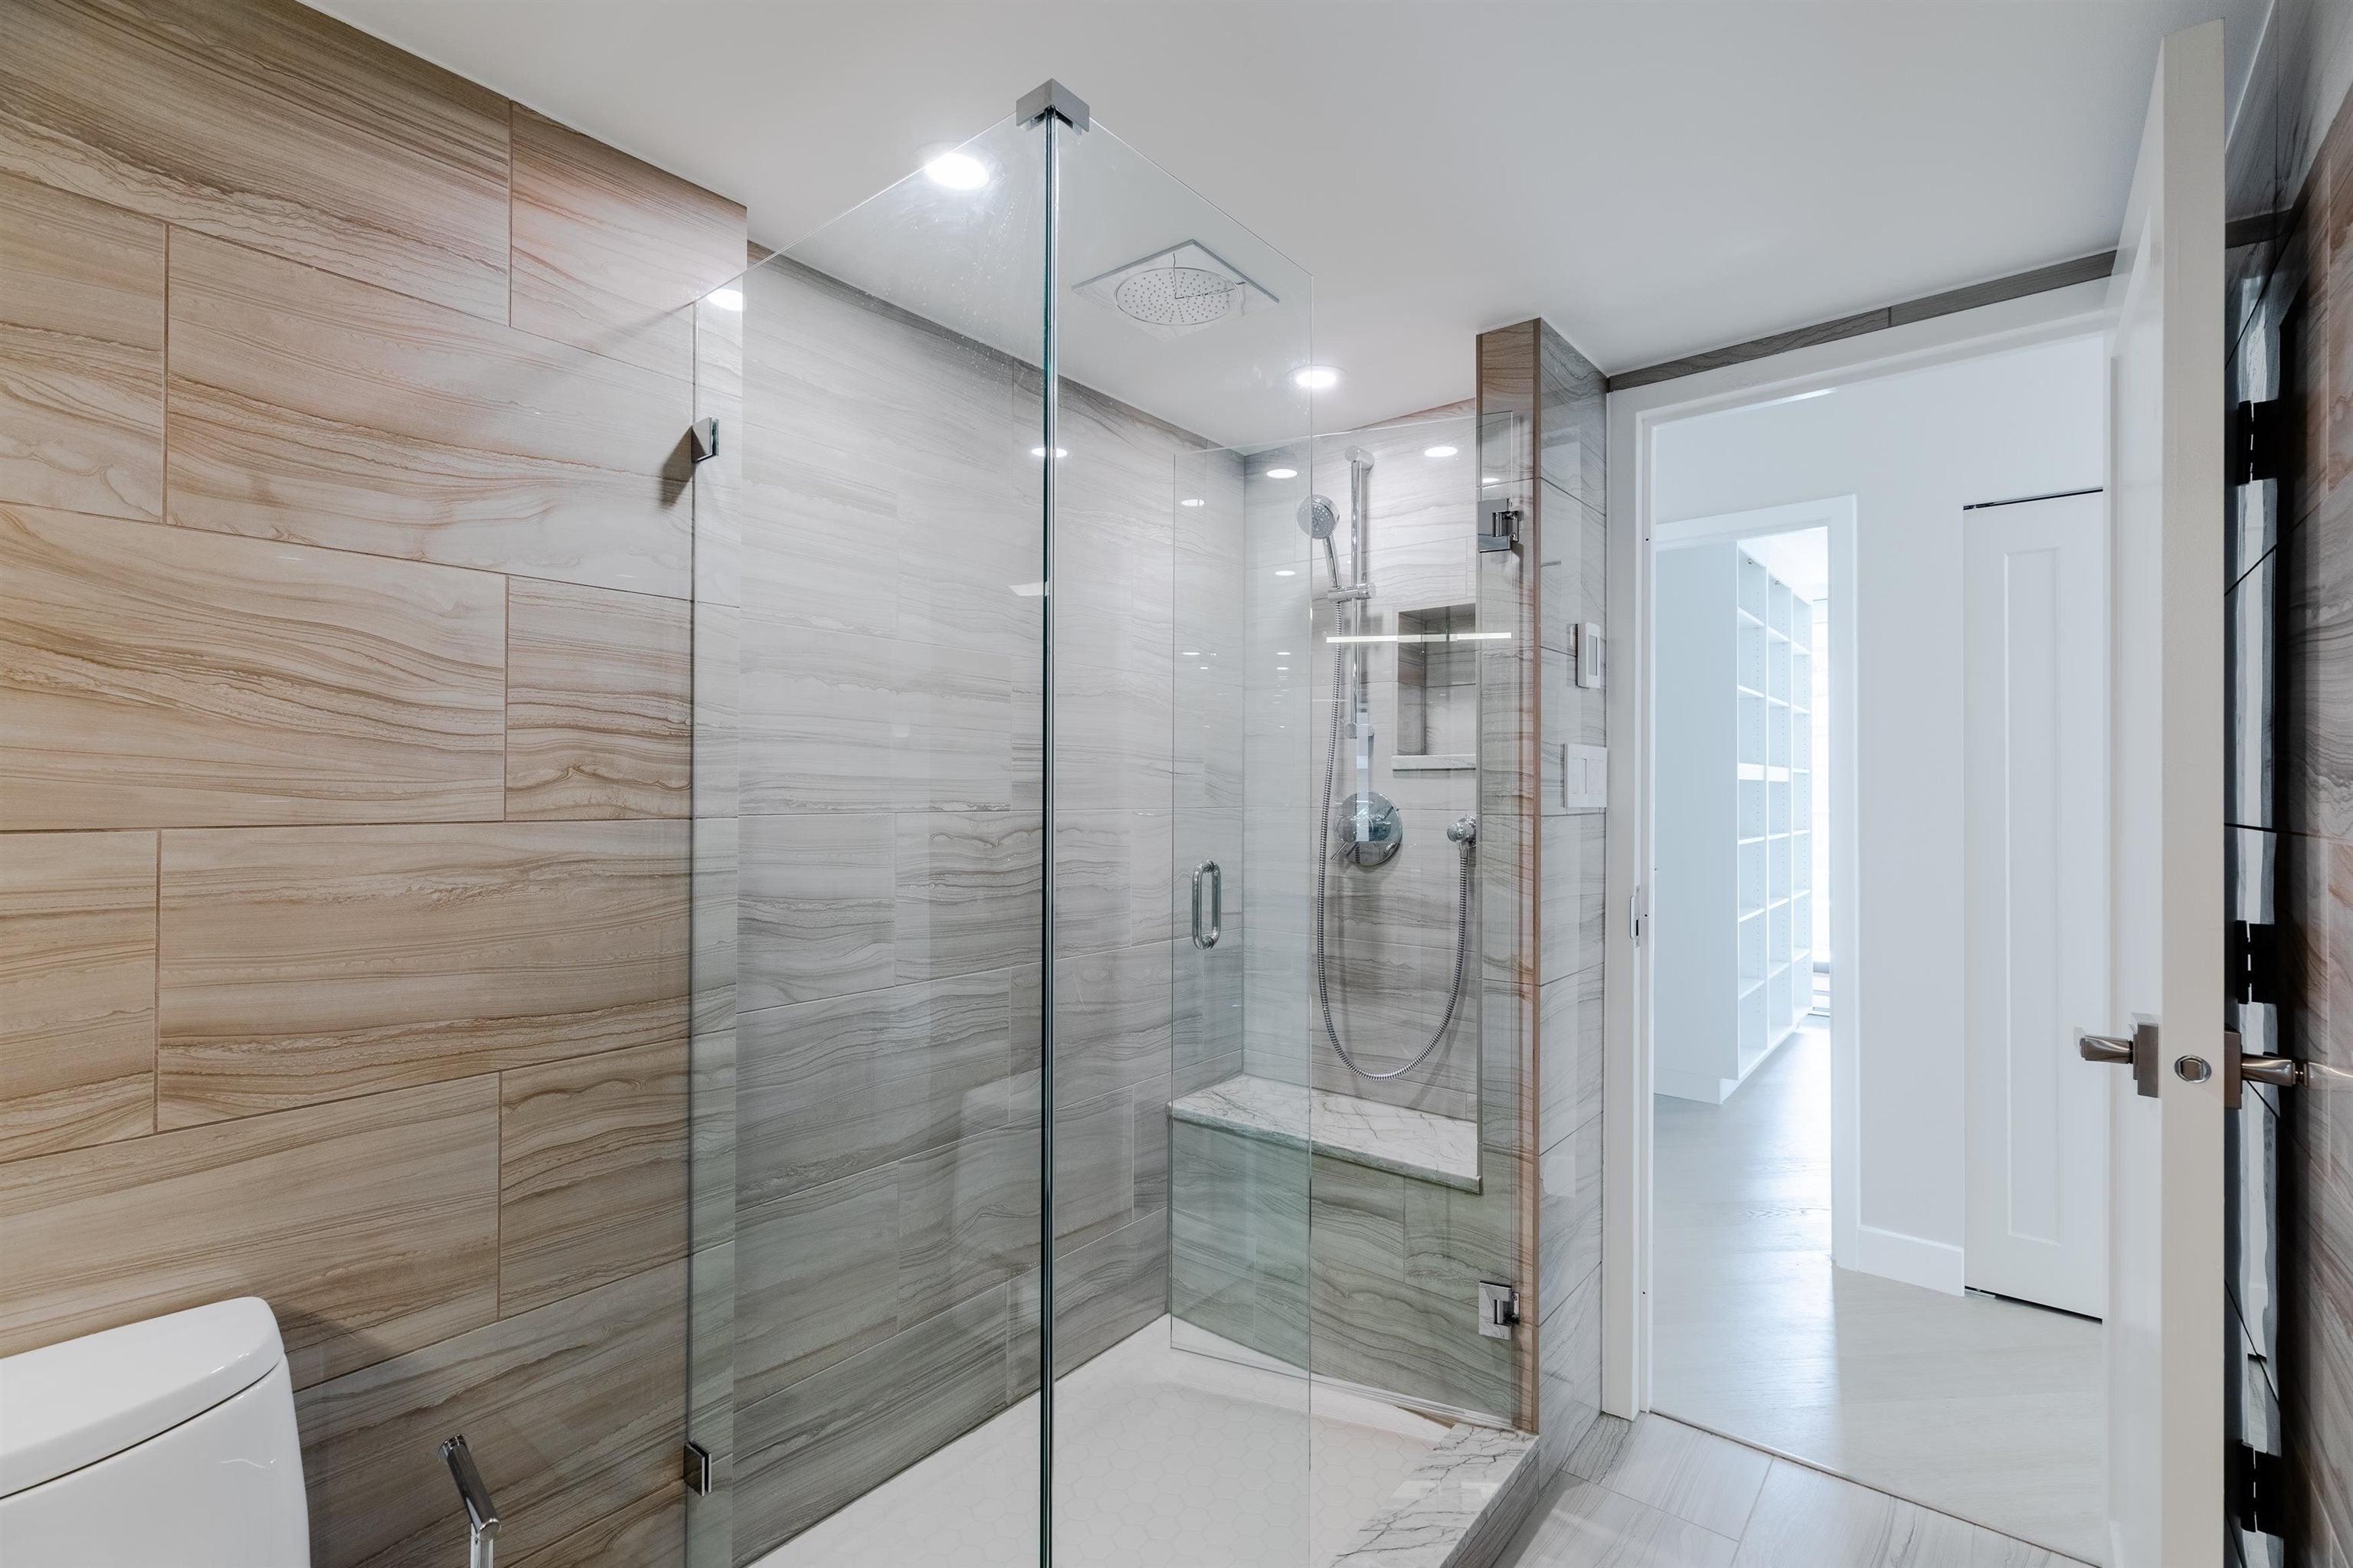 406 1450 PENNYFARTHING DRIVE - False Creek Apartment/Condo for sale, 2 Bedrooms (R2617259) - #6